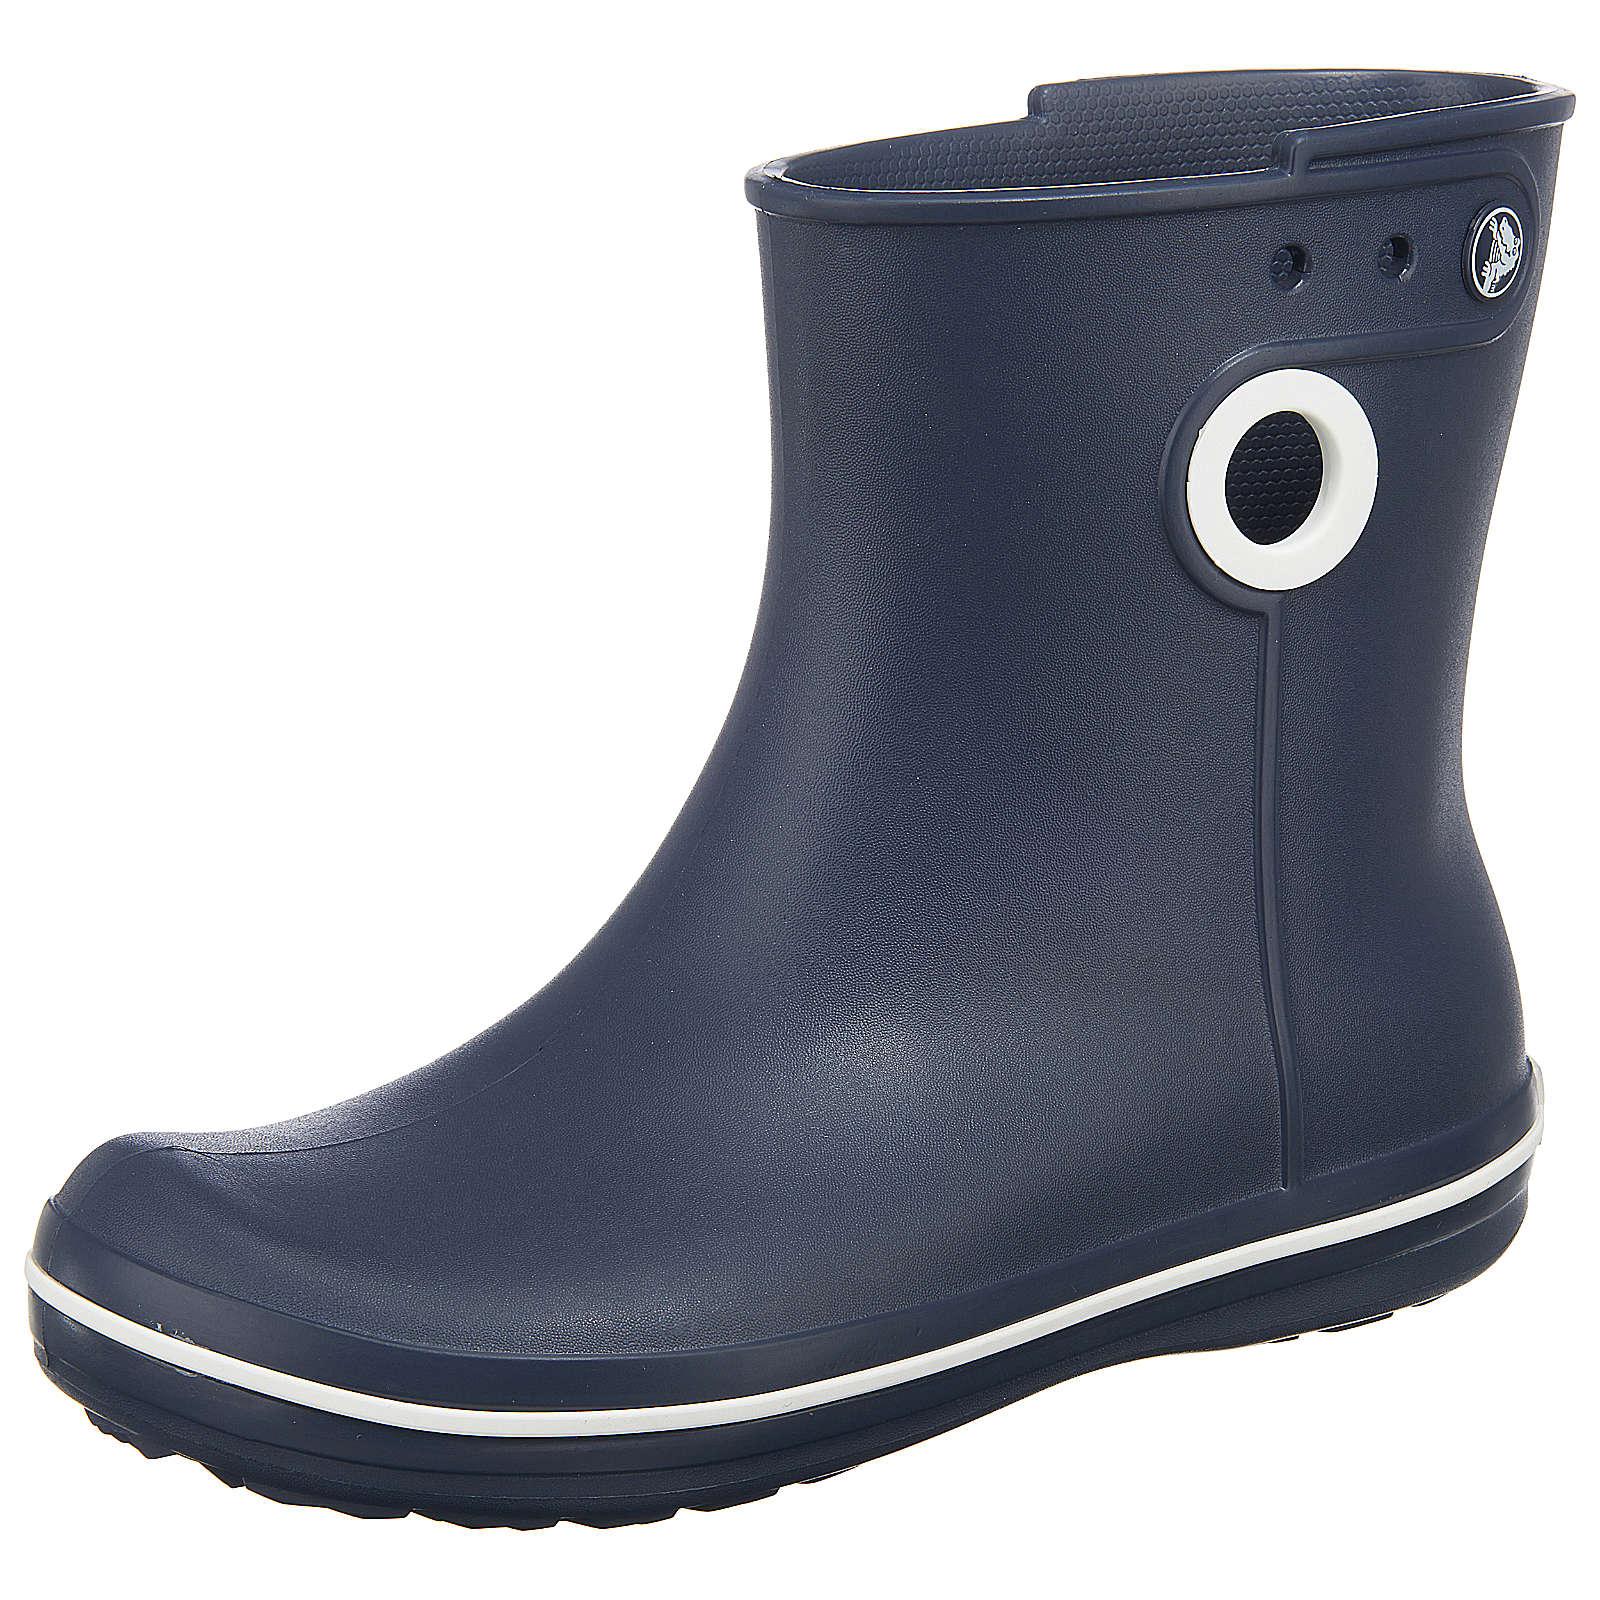 CROCS Jaunt Shorty Boot W Gummistiefel blau Damen Gr. 42/43